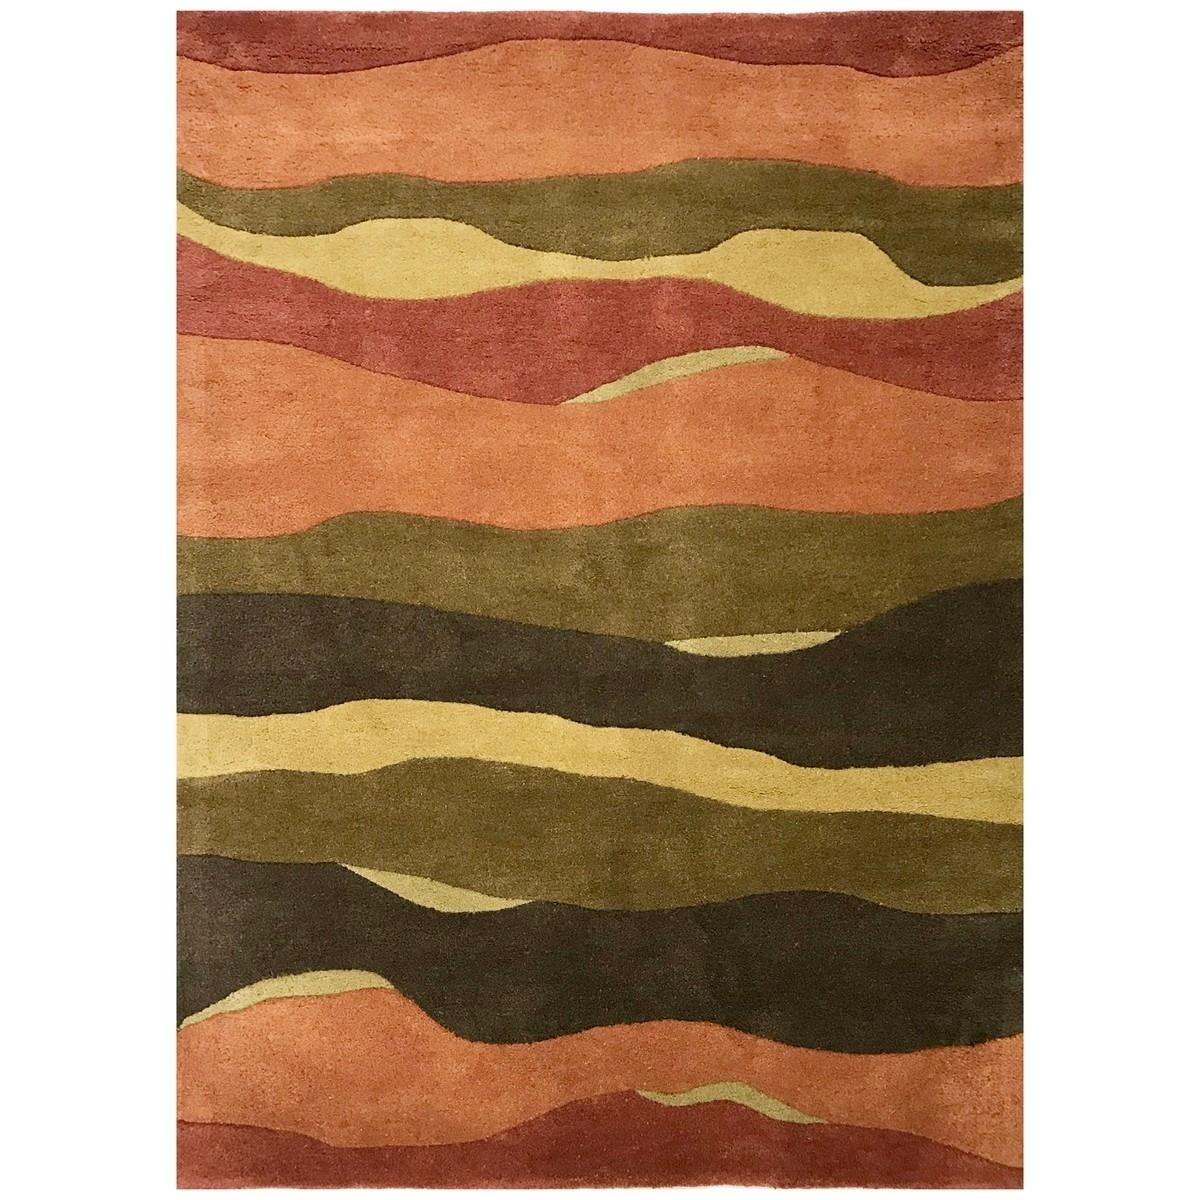 Barrine Hand Tufted Modern Wool Rug, 230x160cm